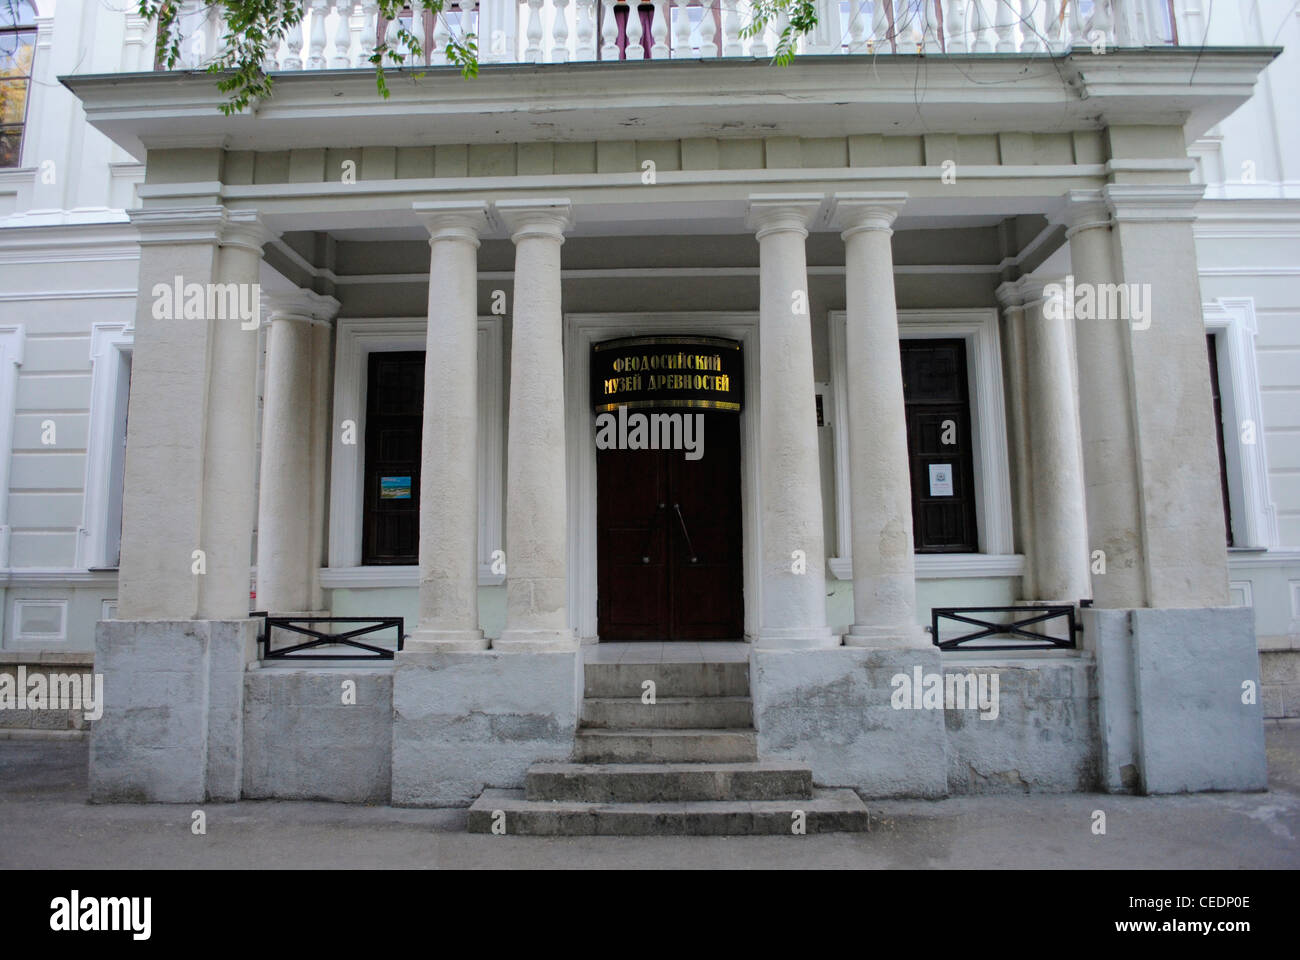 Ukraine. Die autonome Republik Krim. Feodossija Museum für regionale Studien. Fassade. Stockbild